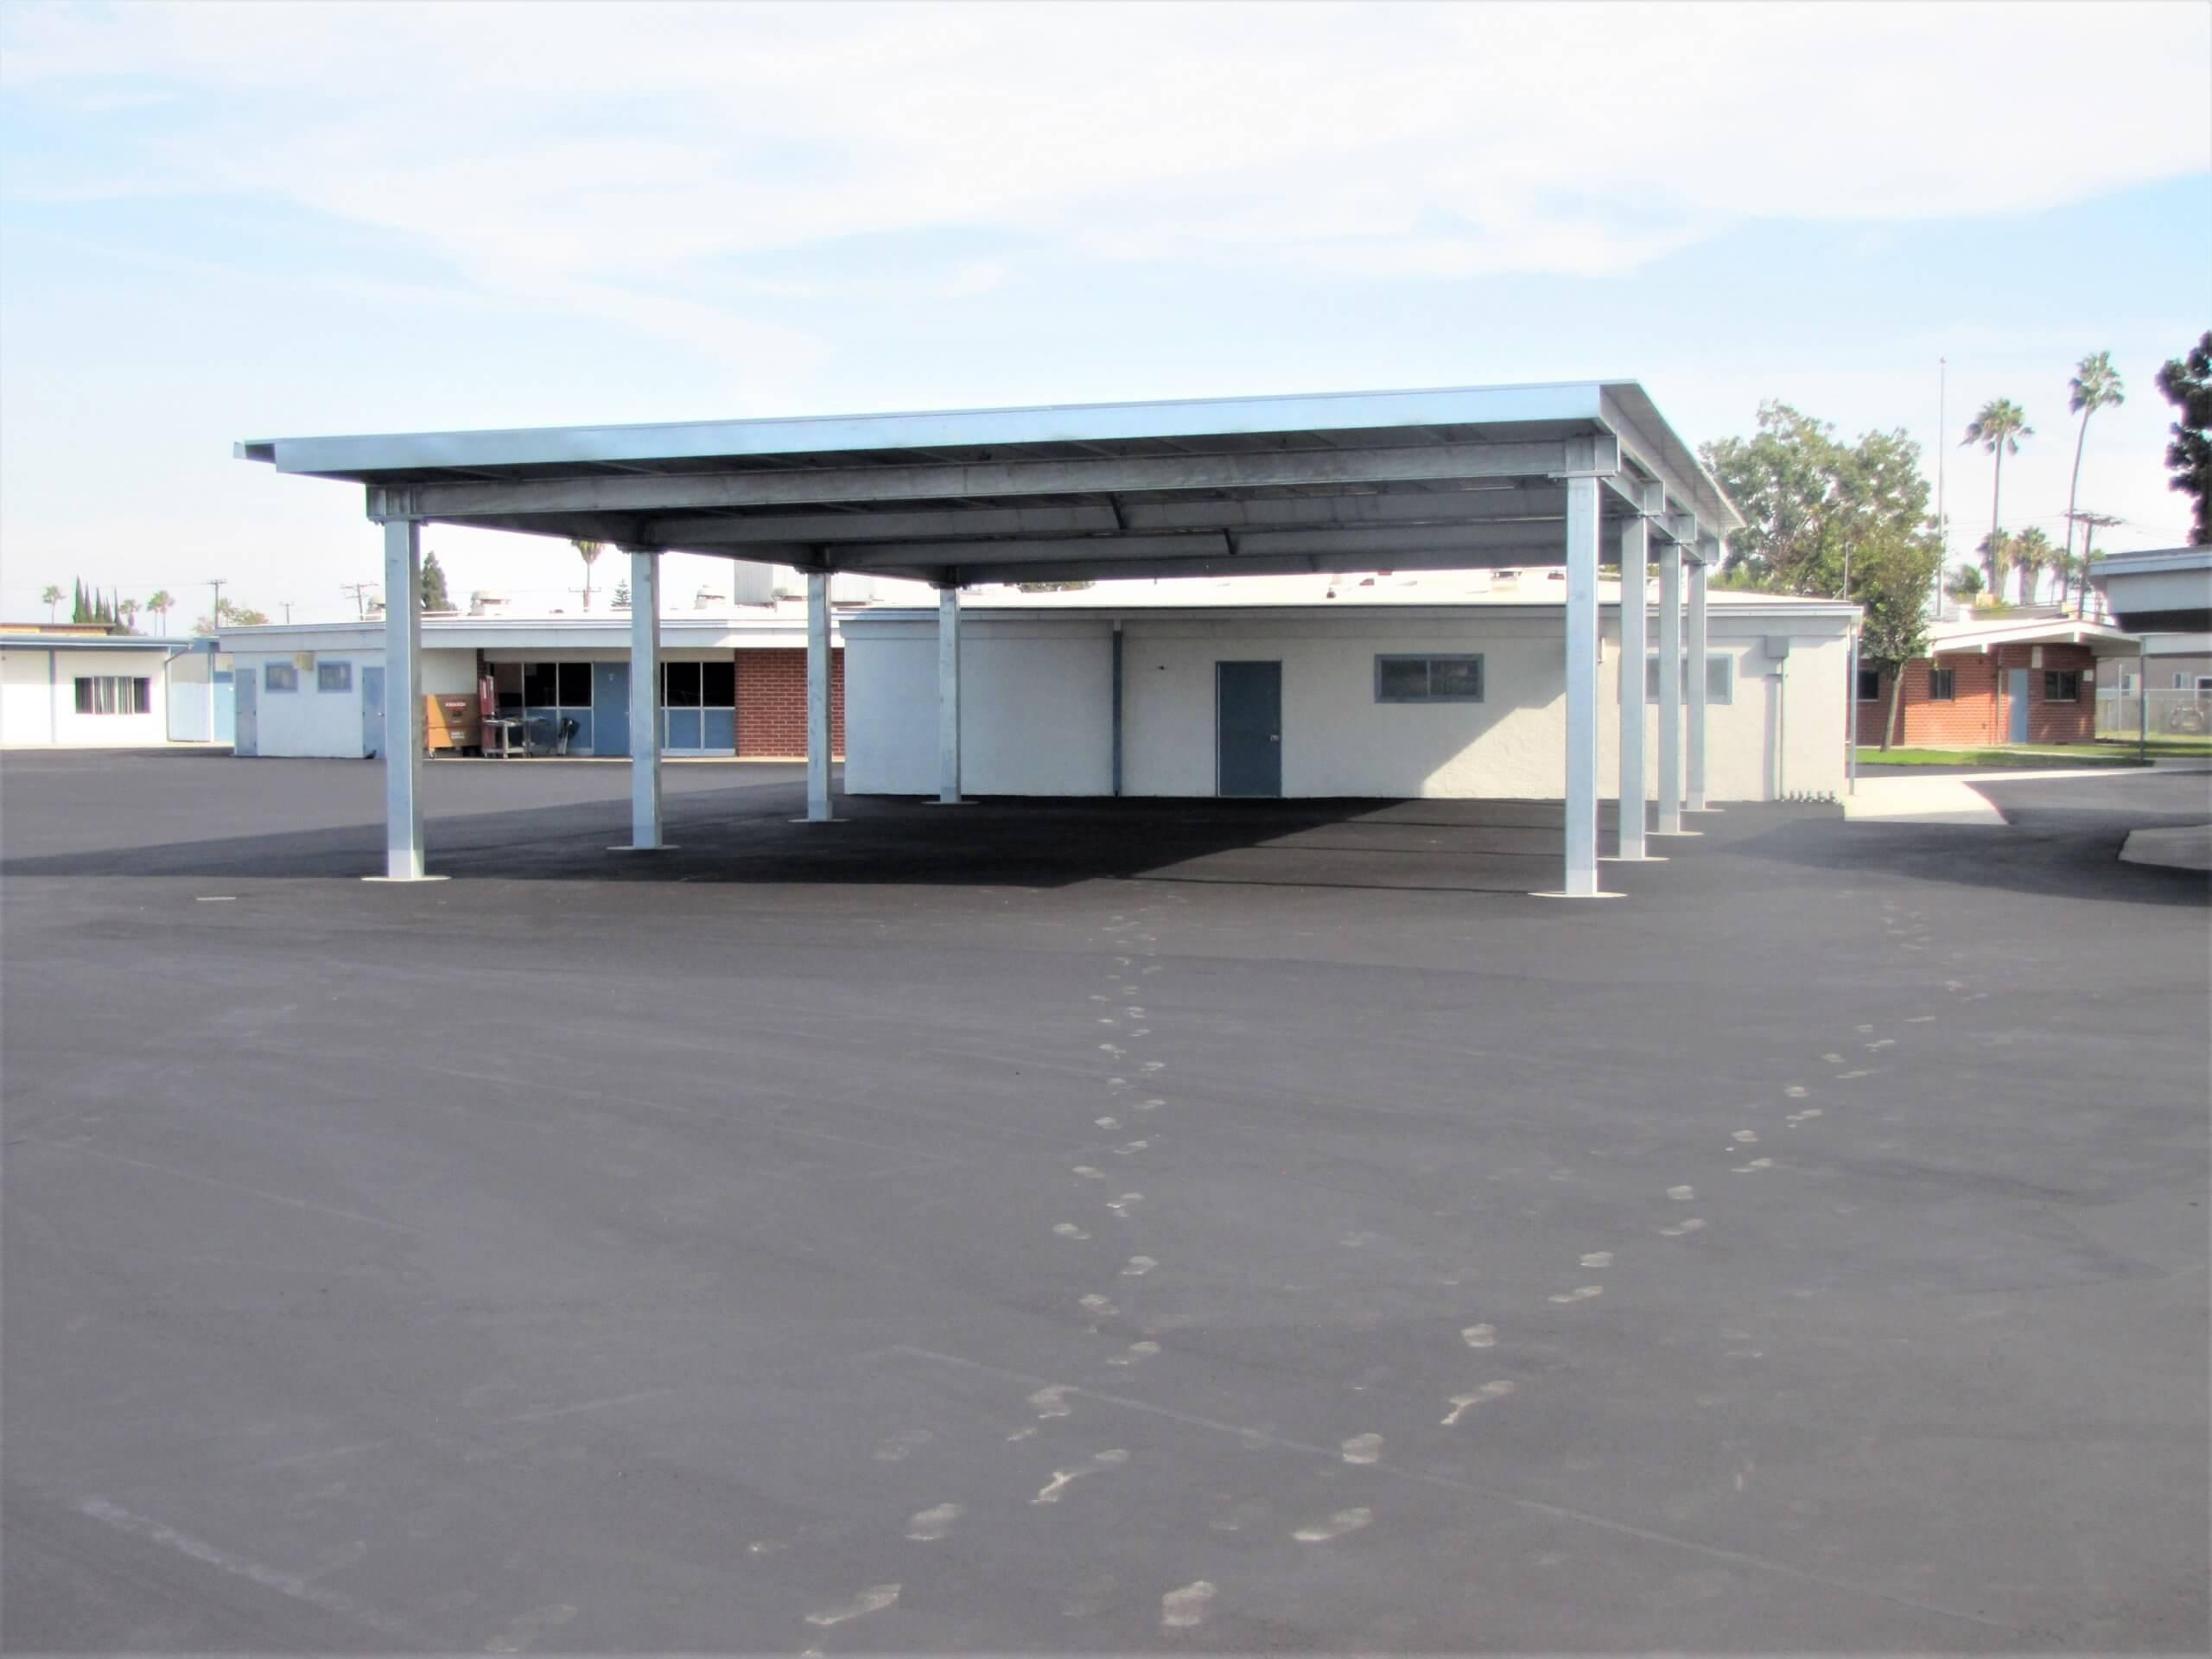 Sunview Elementary